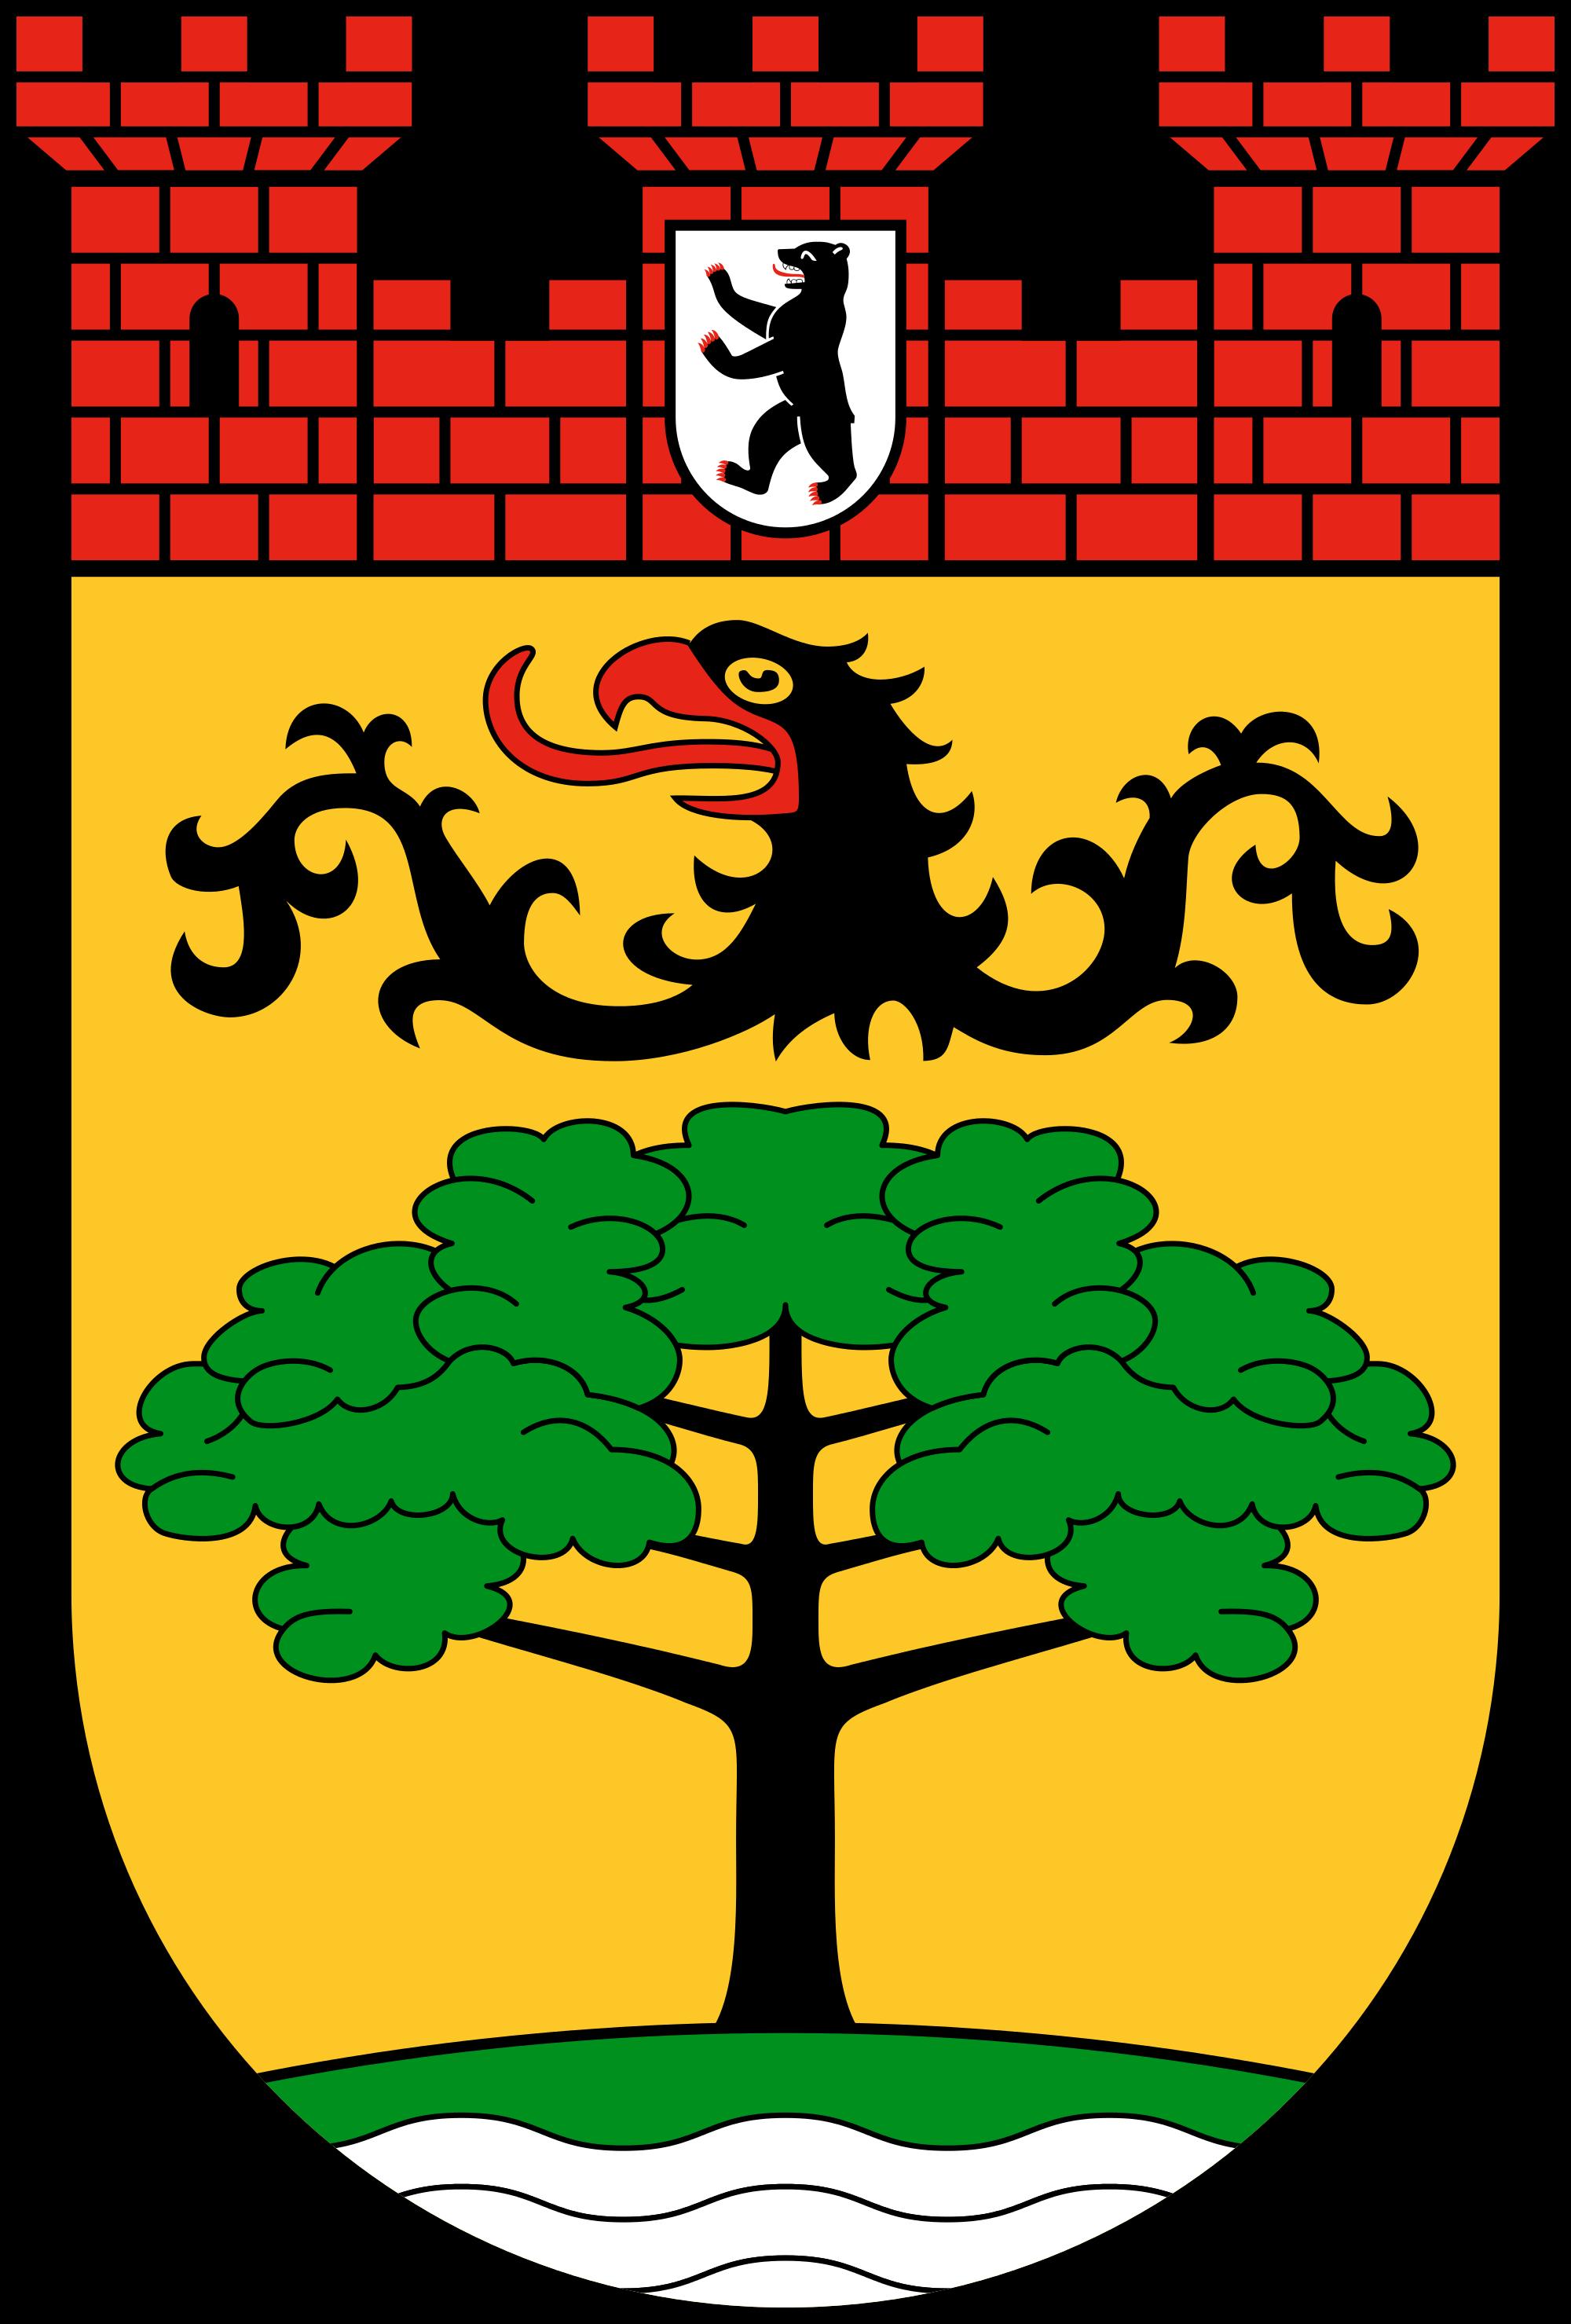 File:Coat of arms of borough Steglitz.